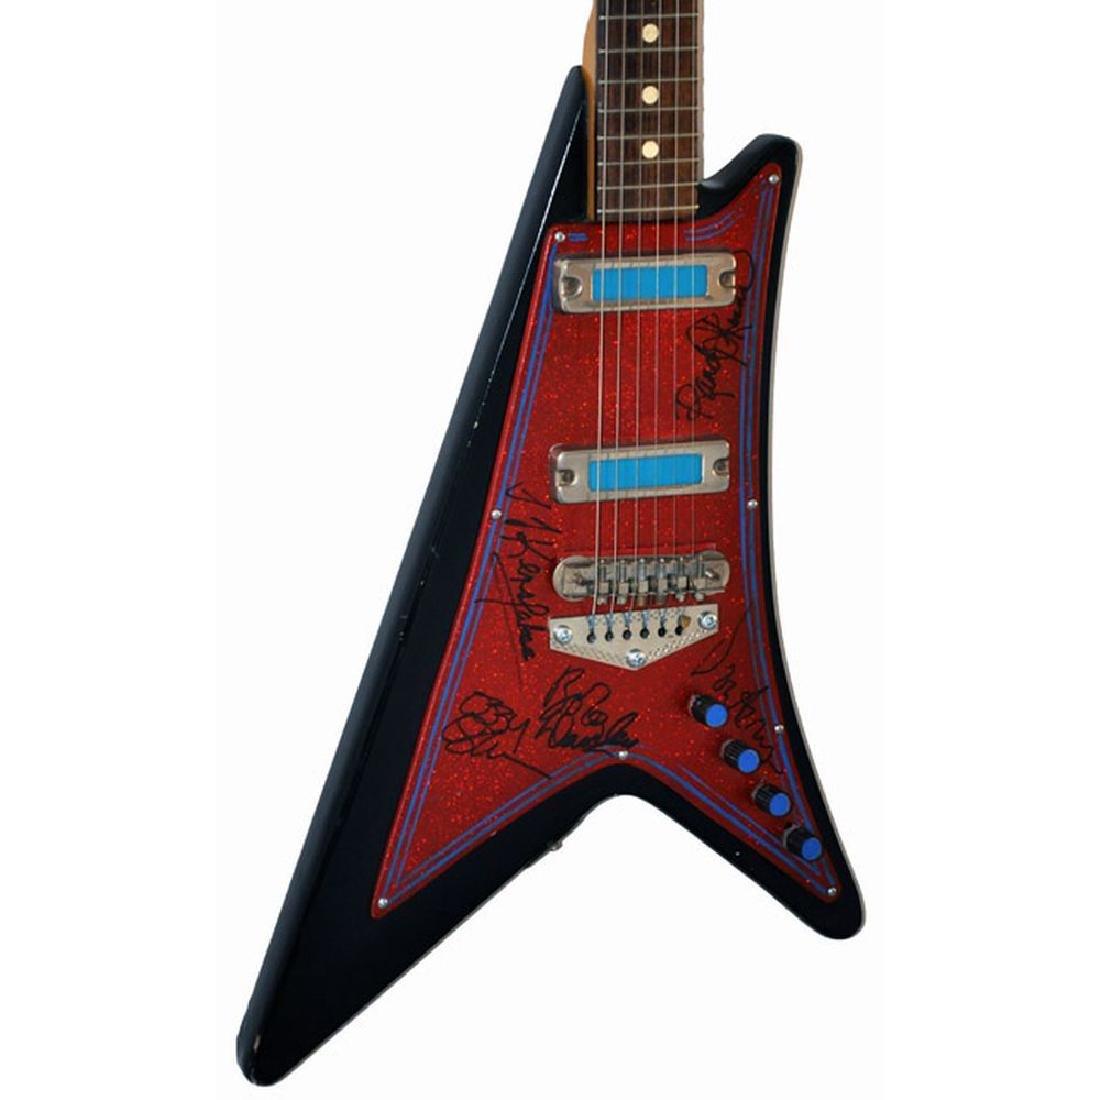 Ozzy Osbourne Band Signed Guitar